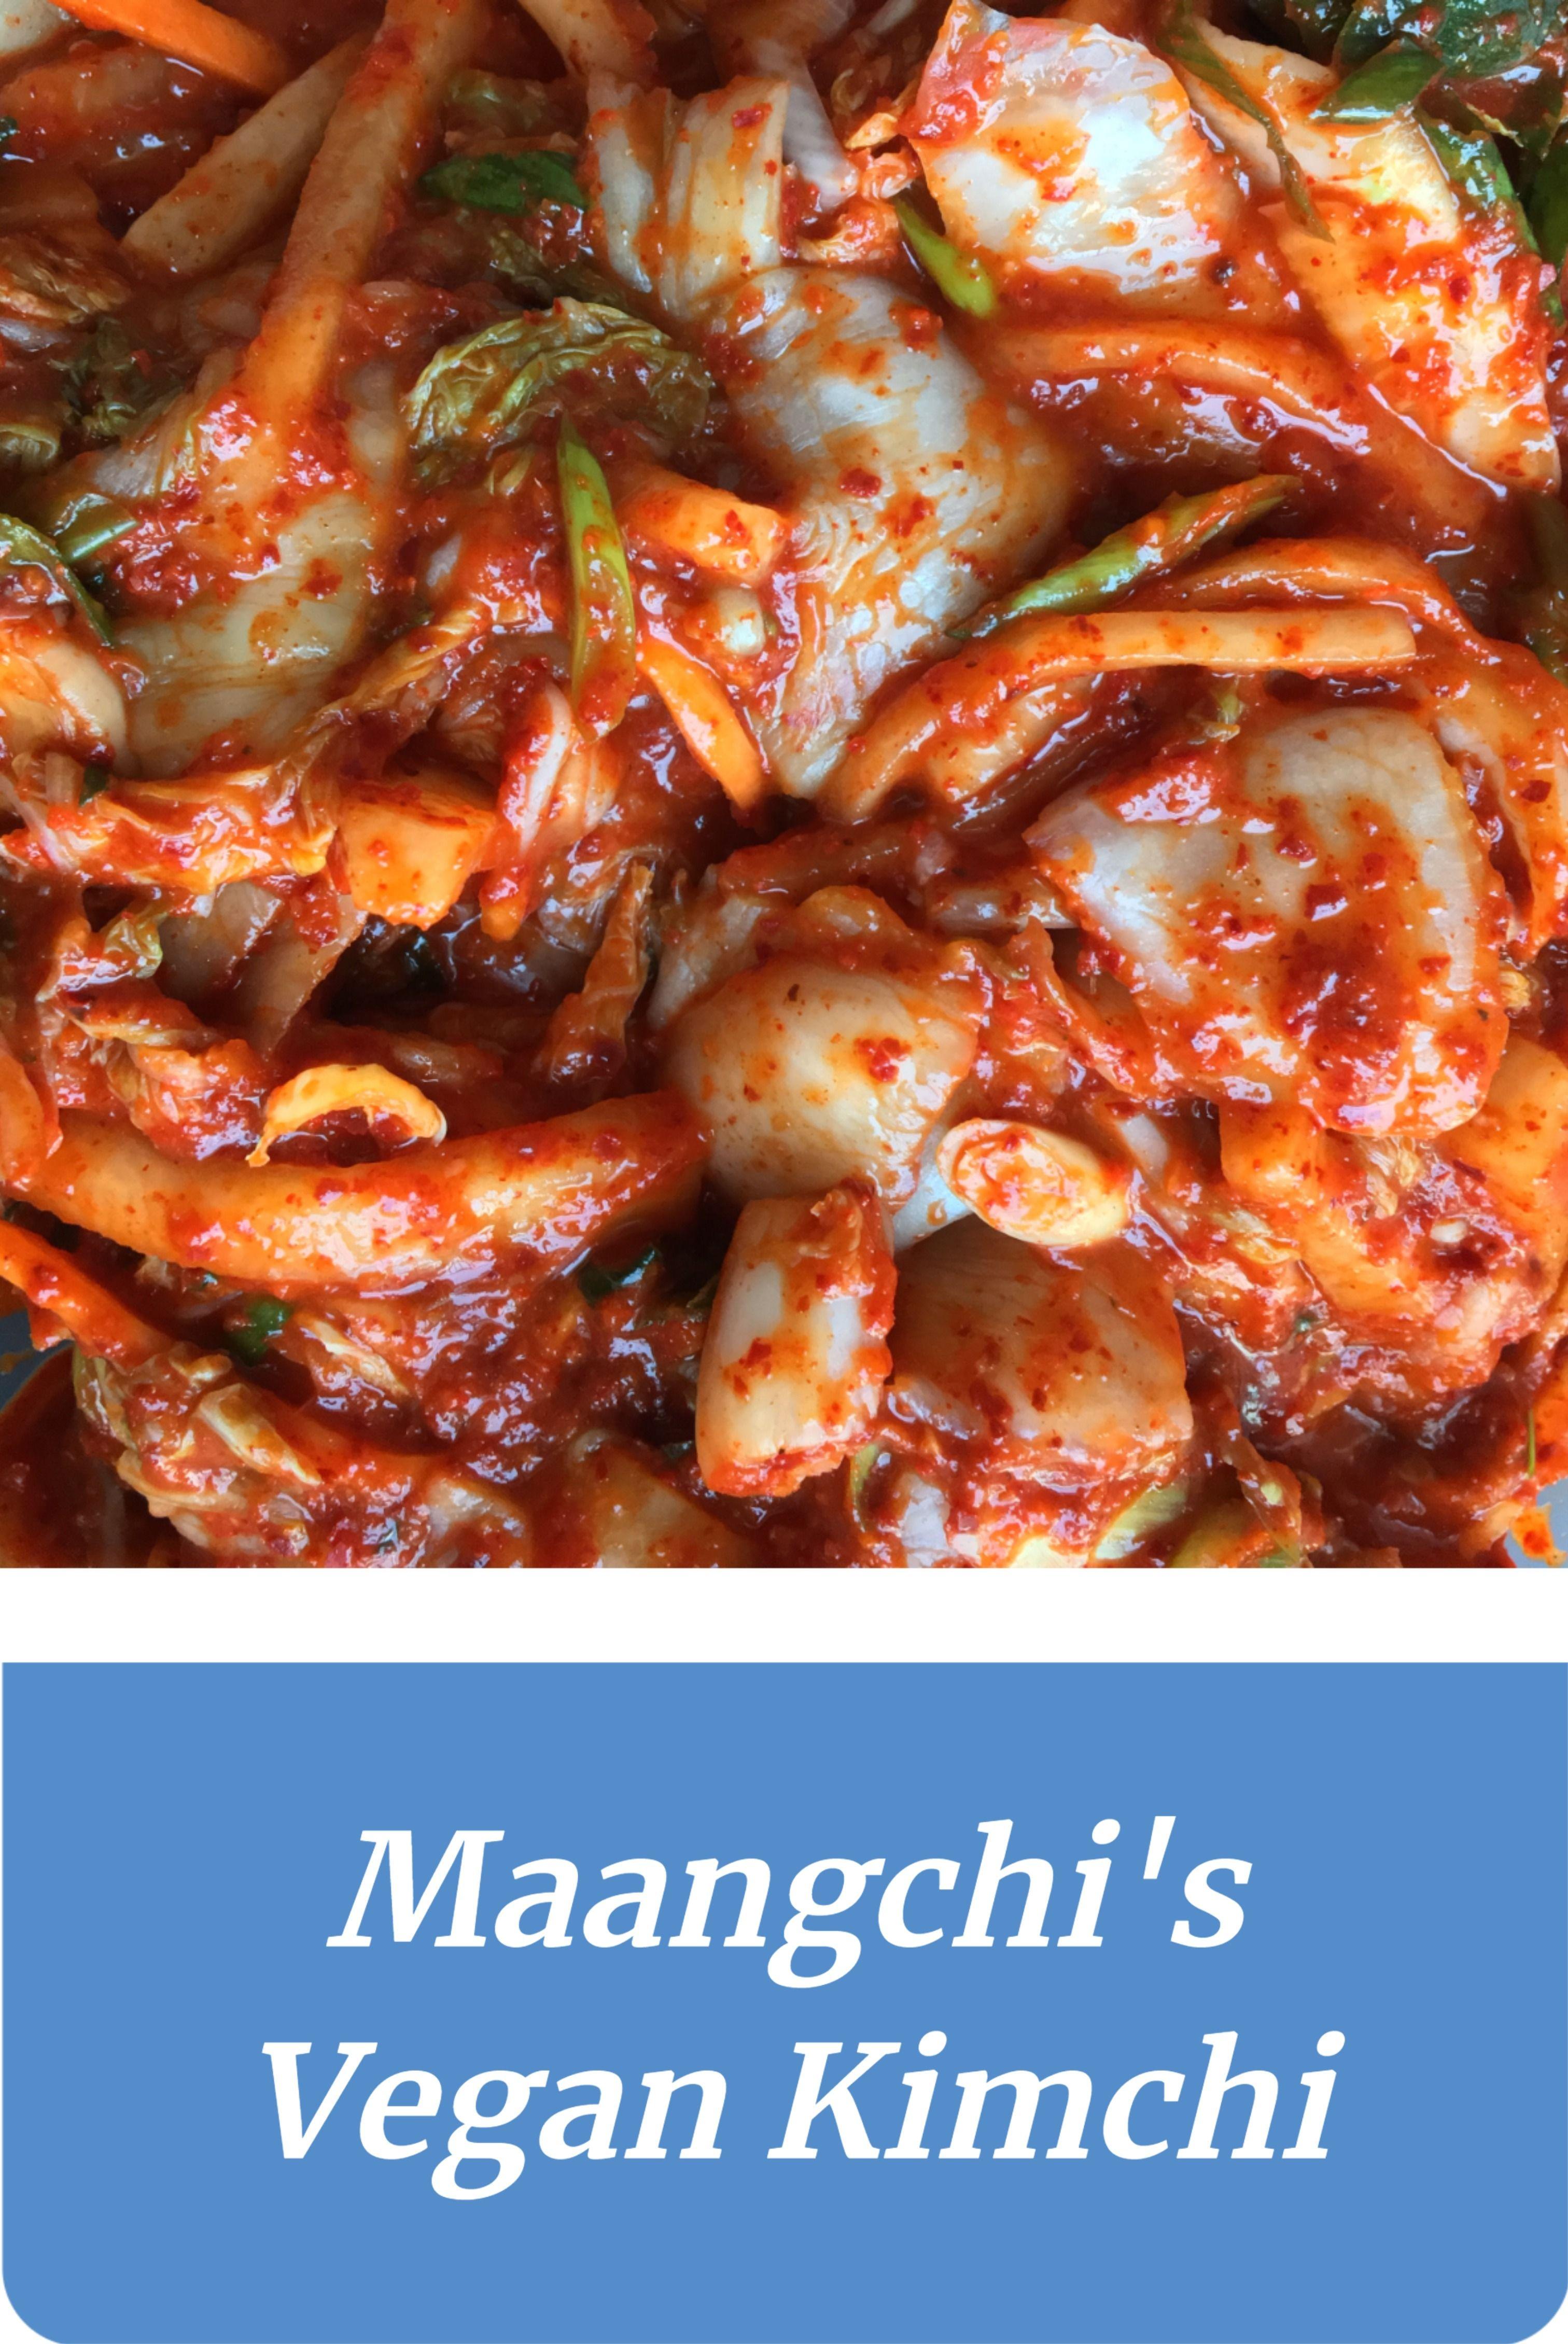 Made Maangchi's recipe for vegan kimchi without fish sauce. Give it a go for a meat/fish-free alternative.  #vegan #veganfood #veganrecipe #vegetarian #vegetarianfood #vegetarianrecipe #recipeideas #korean #koreanfood #kimchi #spicyfood #fermentation #maangchi #homecooking #recipeinspiration #probiotic